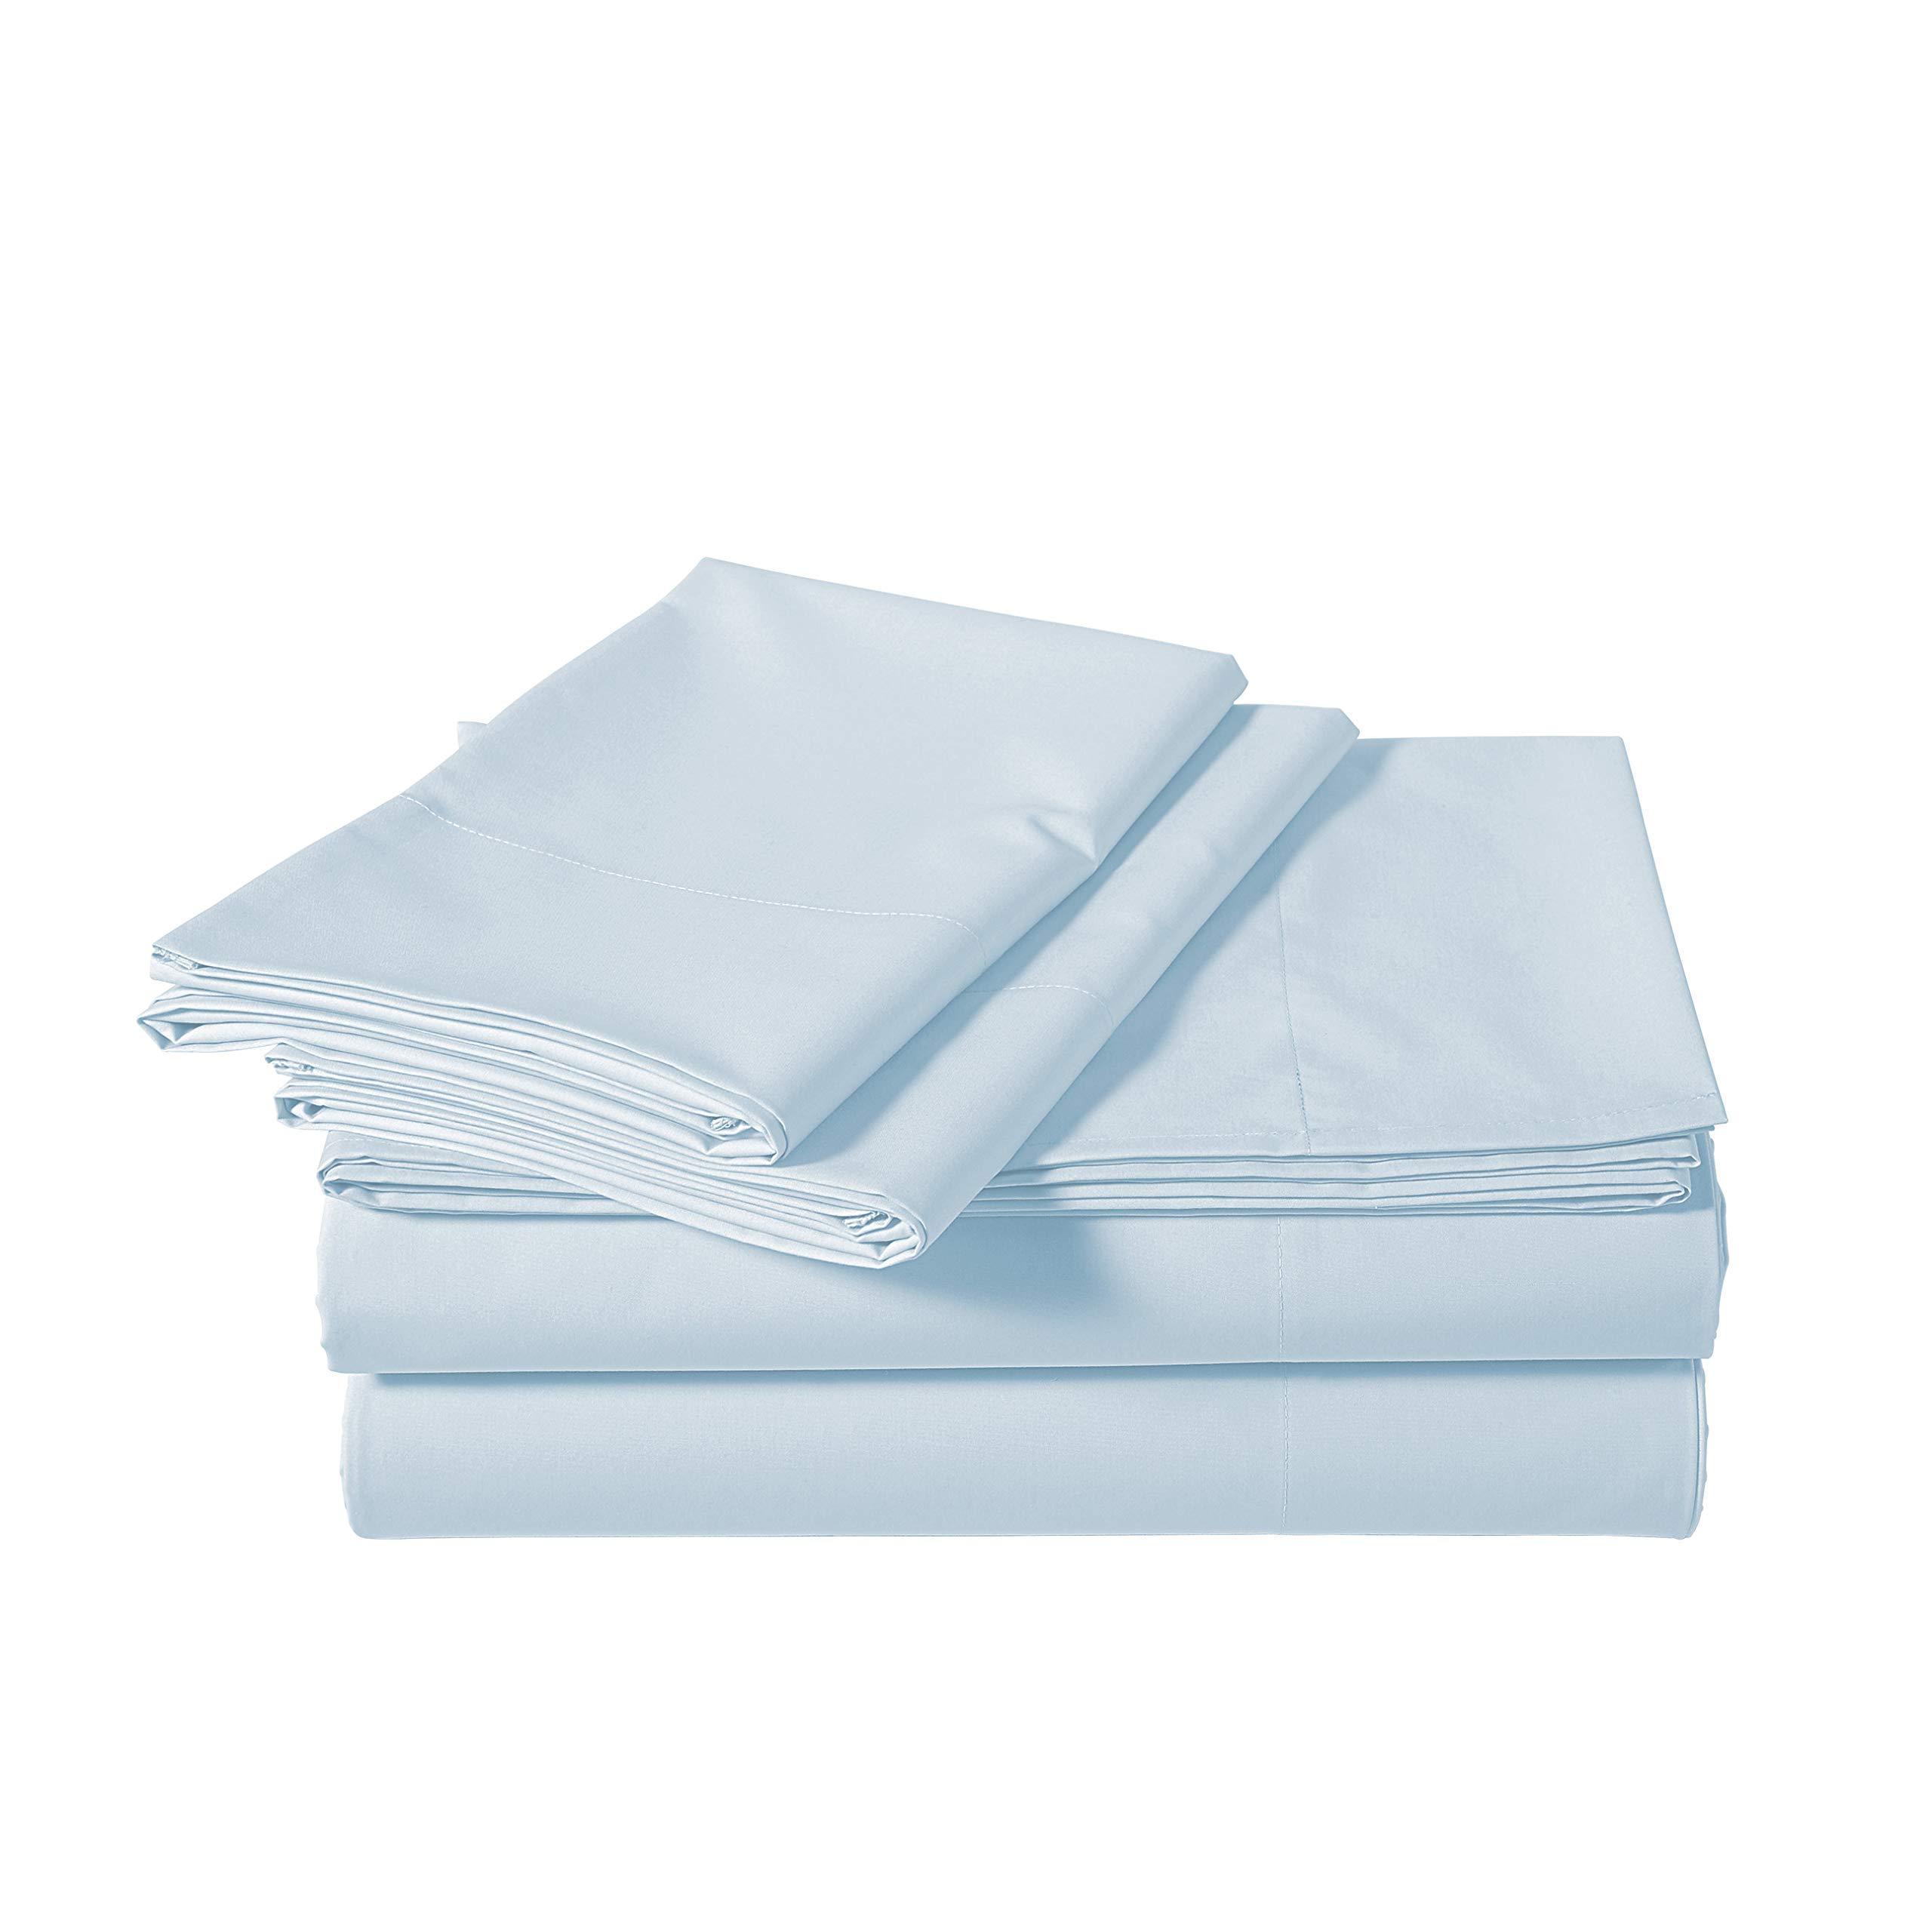 AmazonBasics Lightweight Percale Cotton Sheet Set - King, Blue Pastel